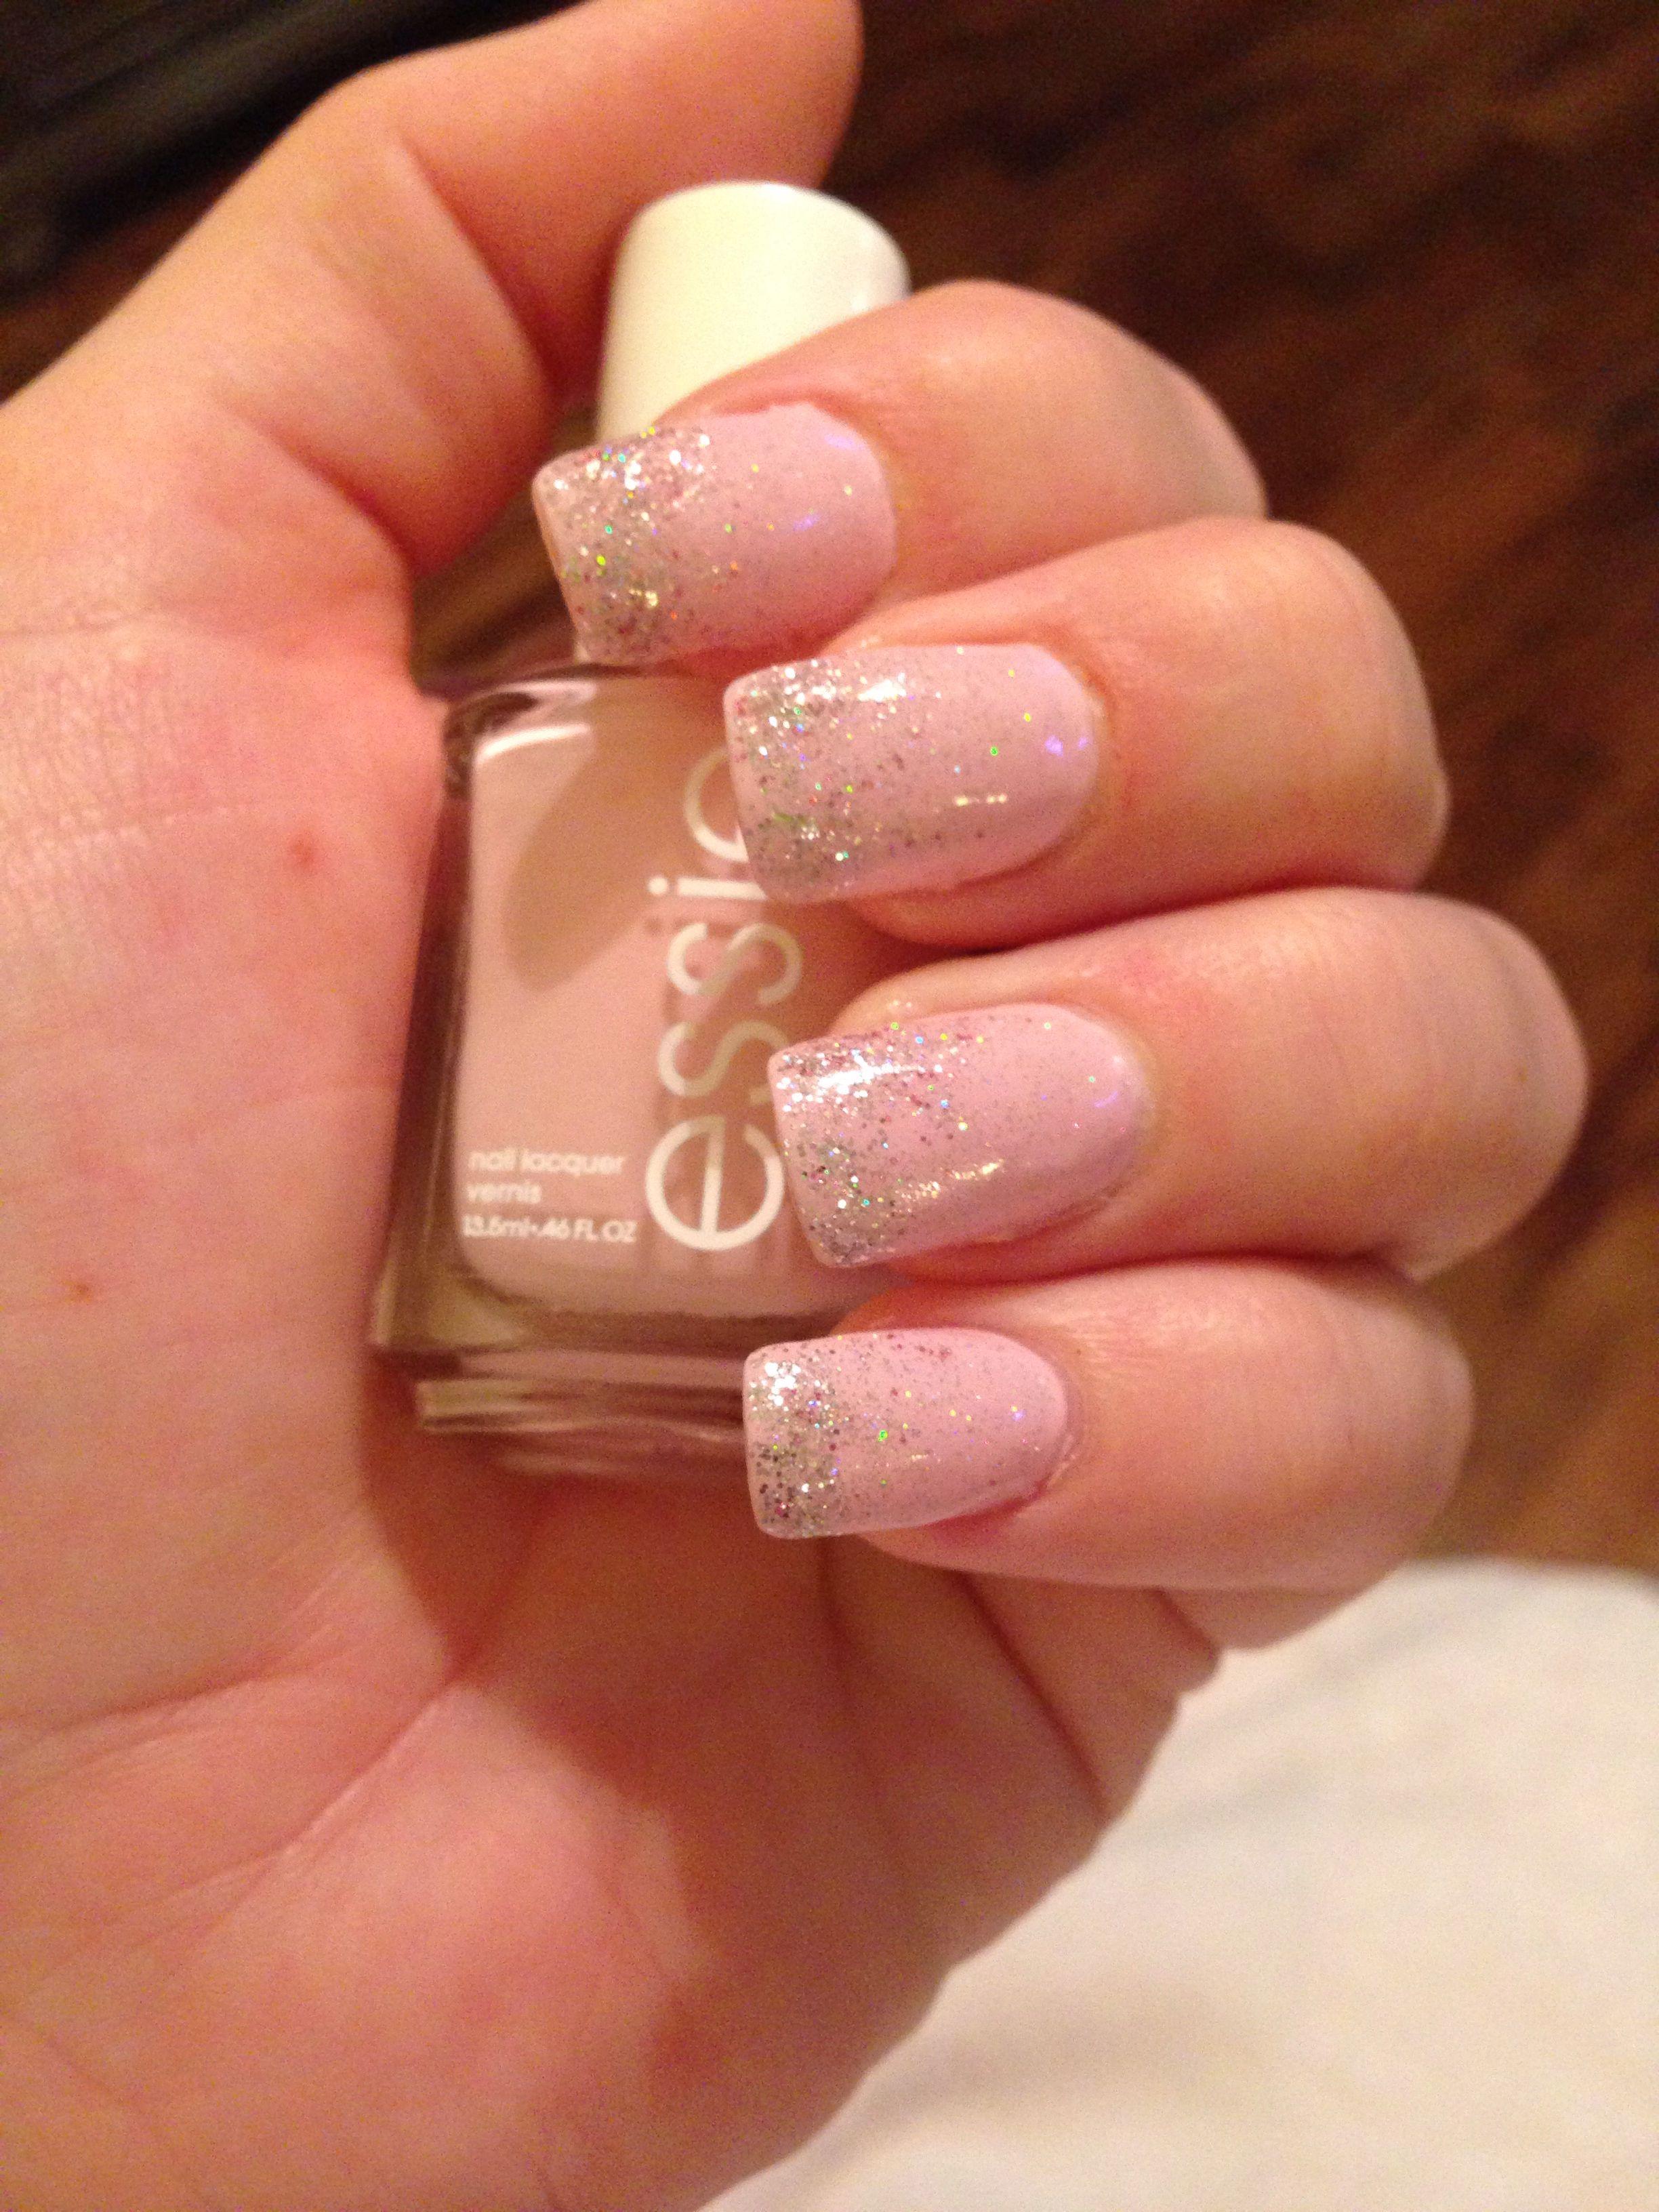 Ombre glitter nail, Essie nail Polish | My Style | Pinterest | Essie ...